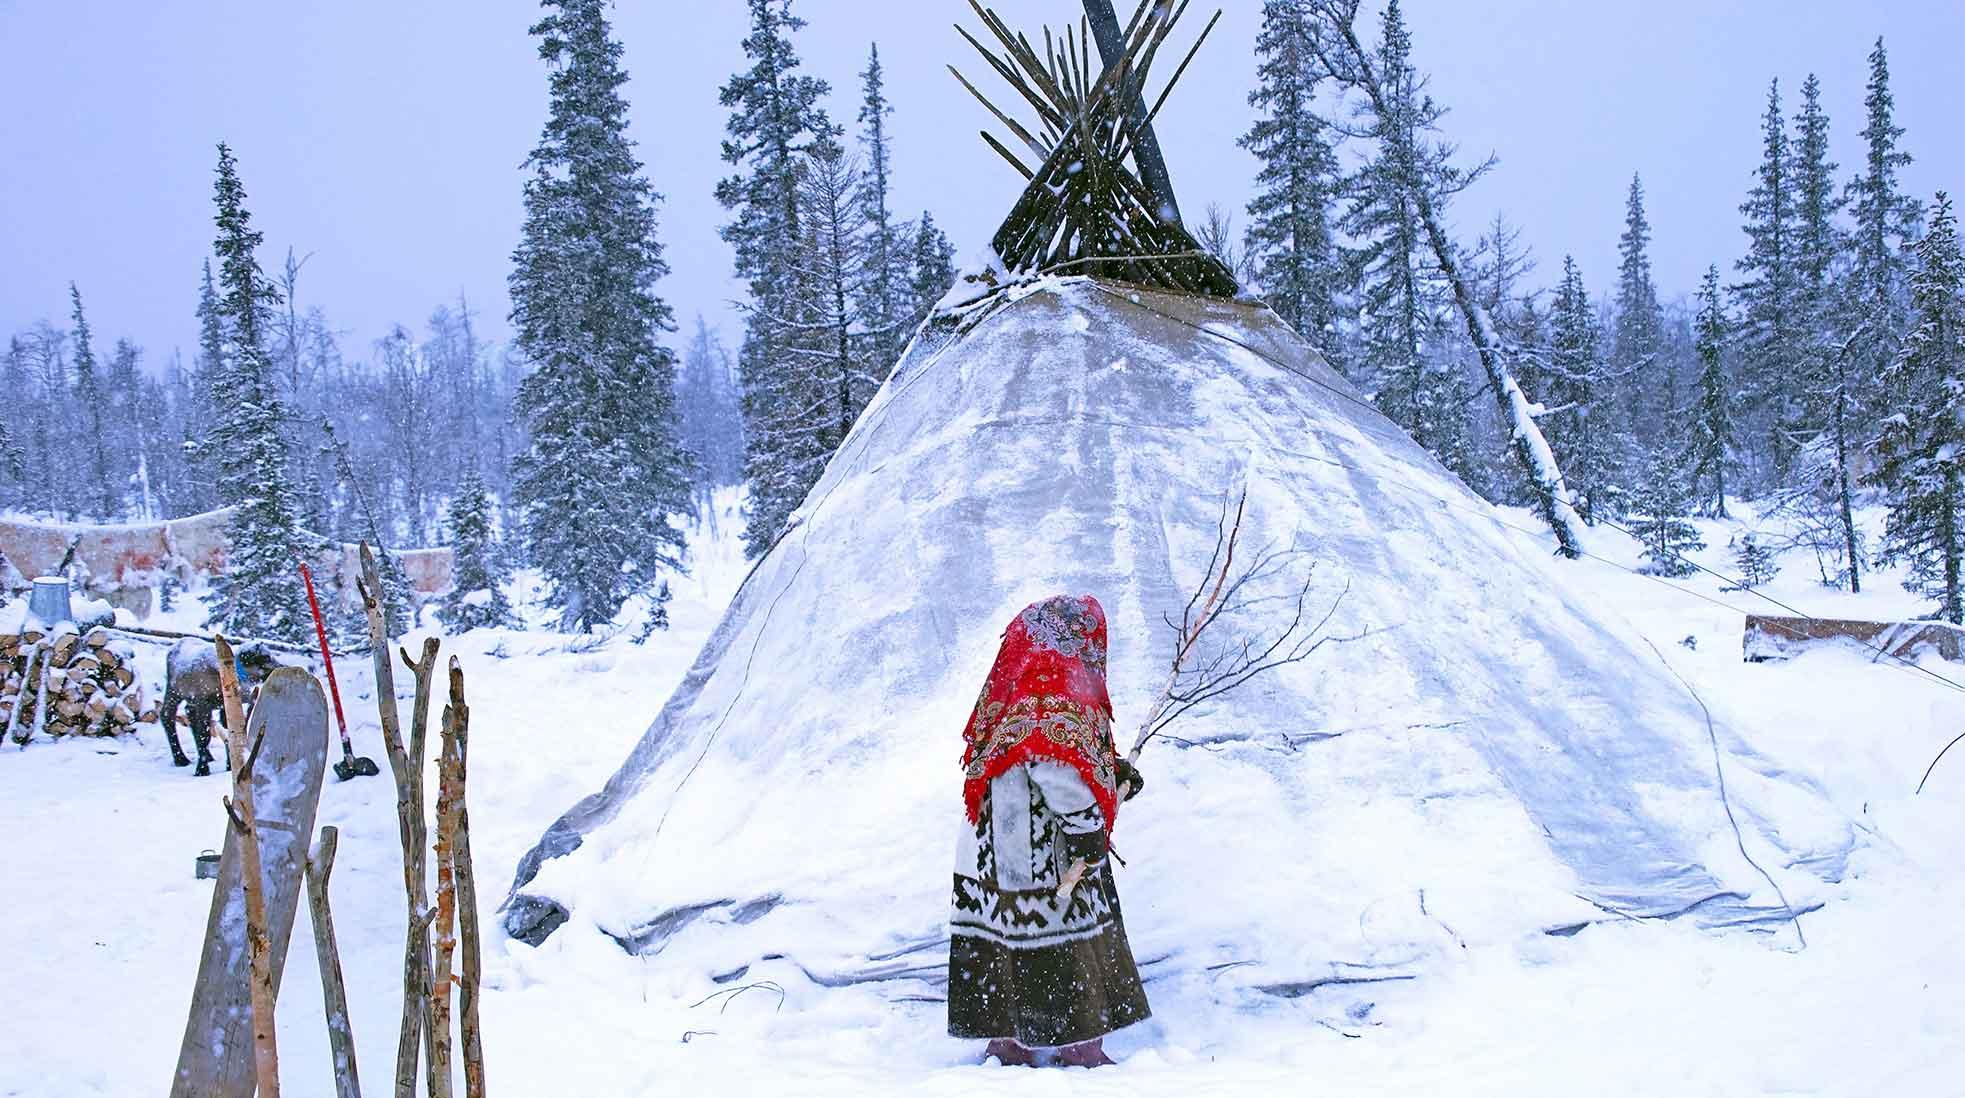 Nentser, norra Sibirien, Ryssland. Foto: Hans-Jurgen Mager / Unsplash